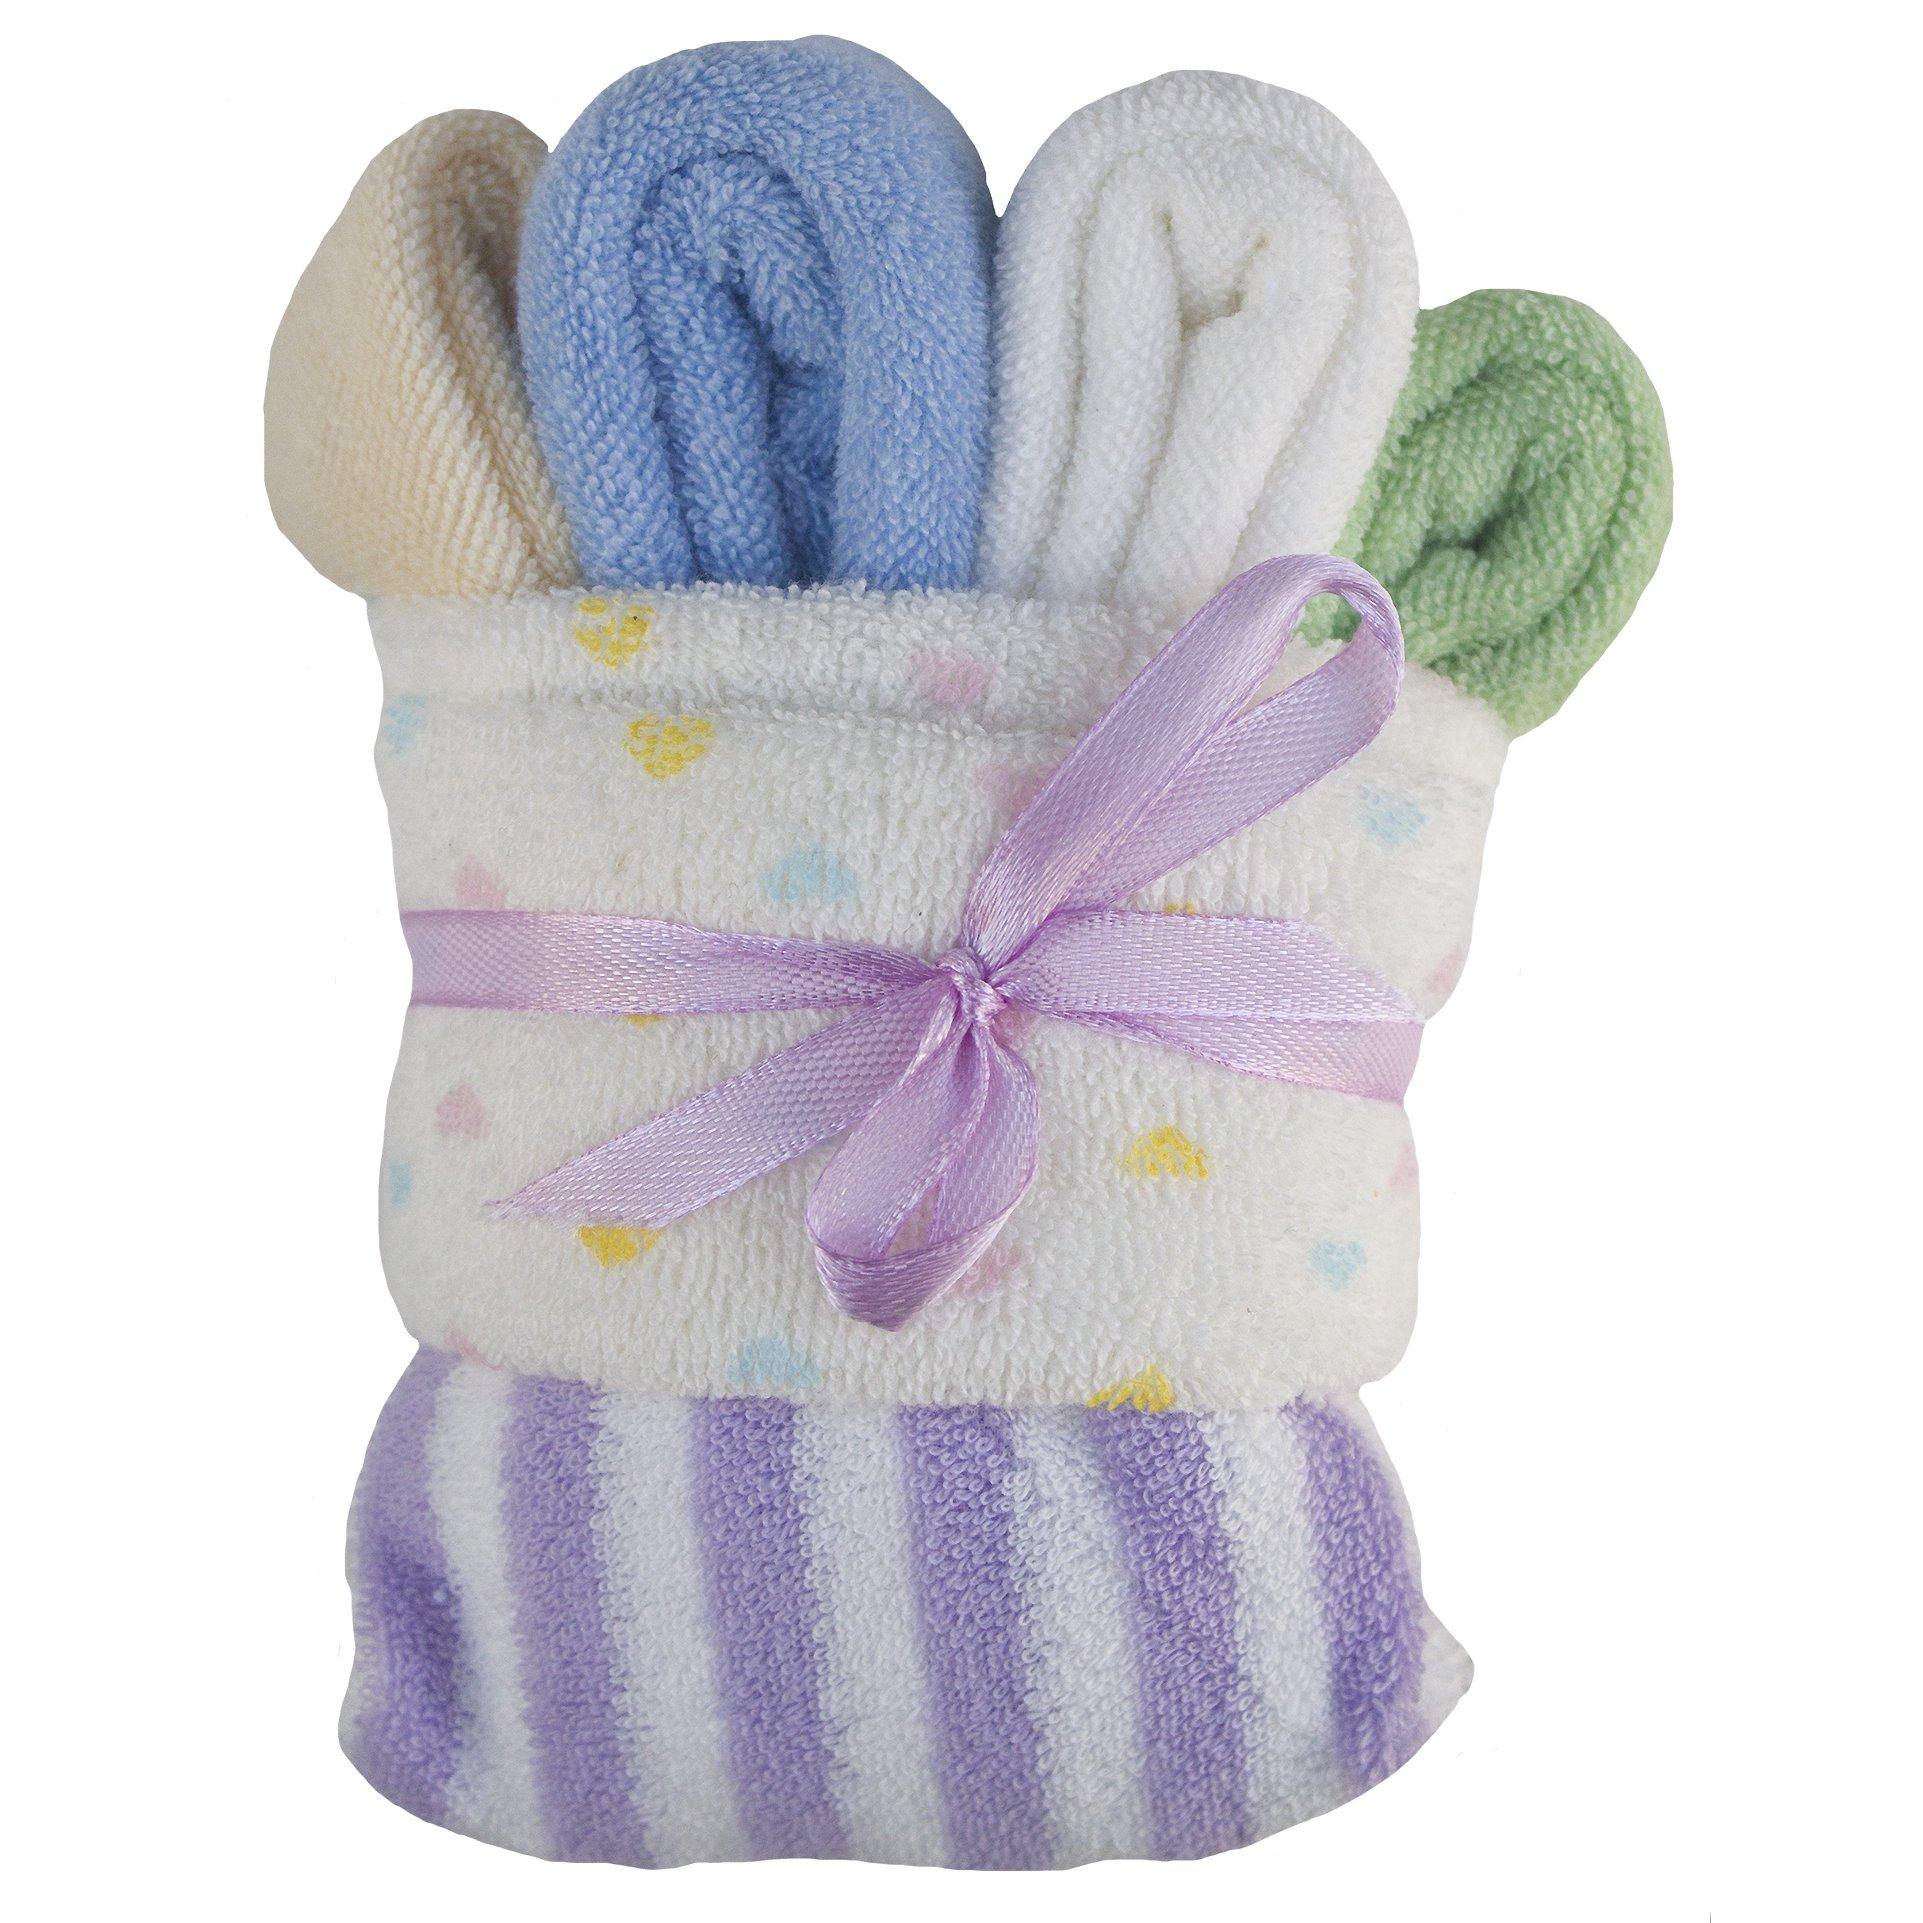 PurpleRain Baby Washcloths, 6 Ultra Soft by purple rain